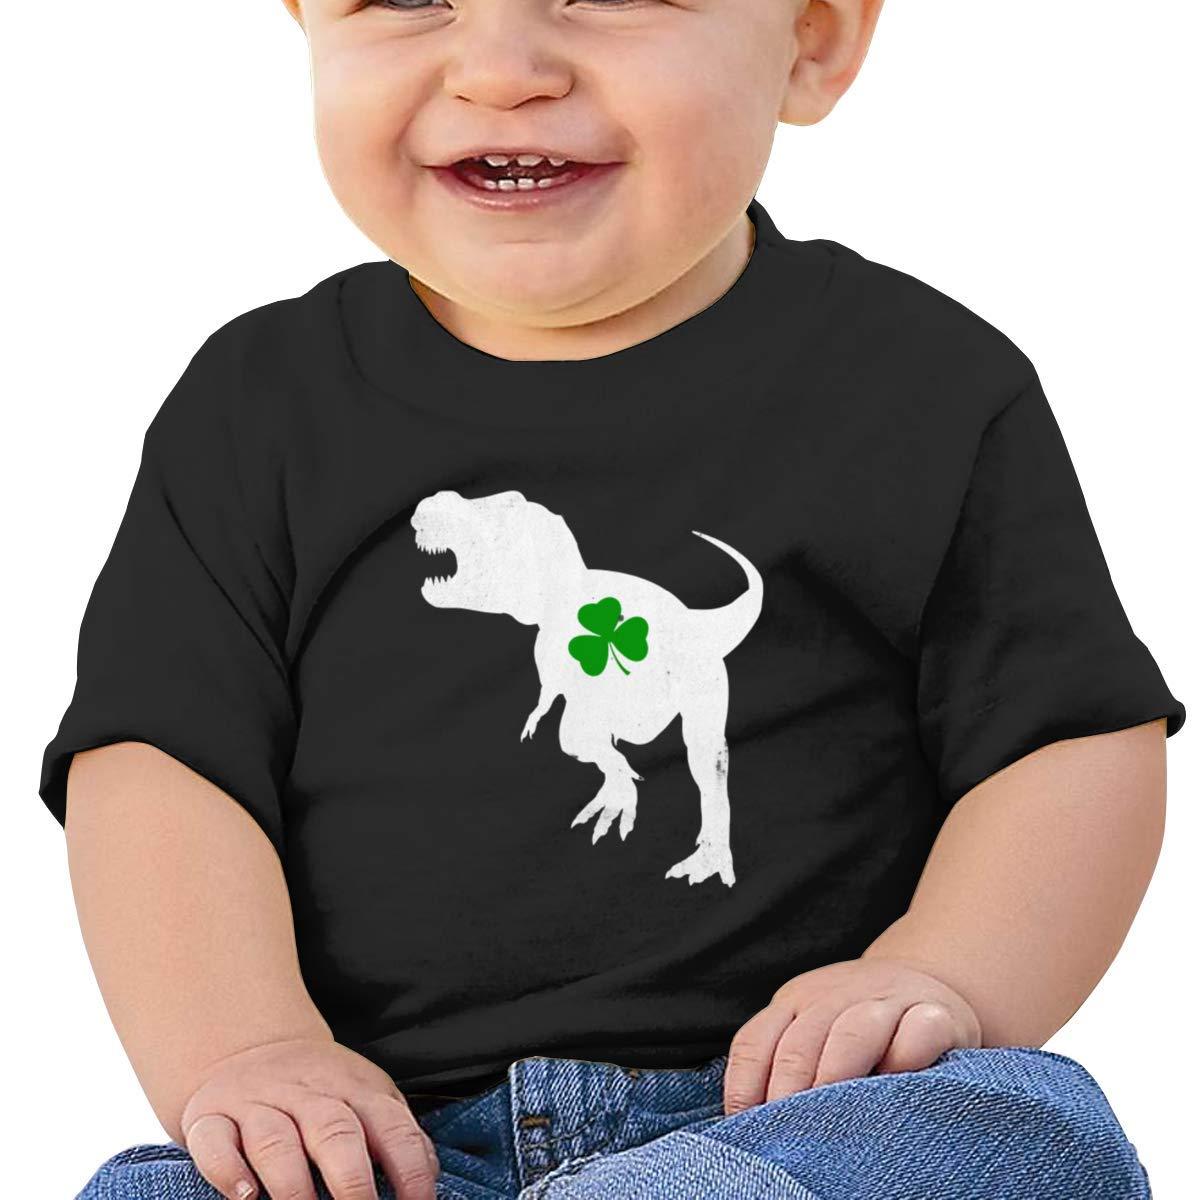 Irish T-Rex Dinosaur Clover St Patricks Day Short Sleeve Tshirt Baby Girl